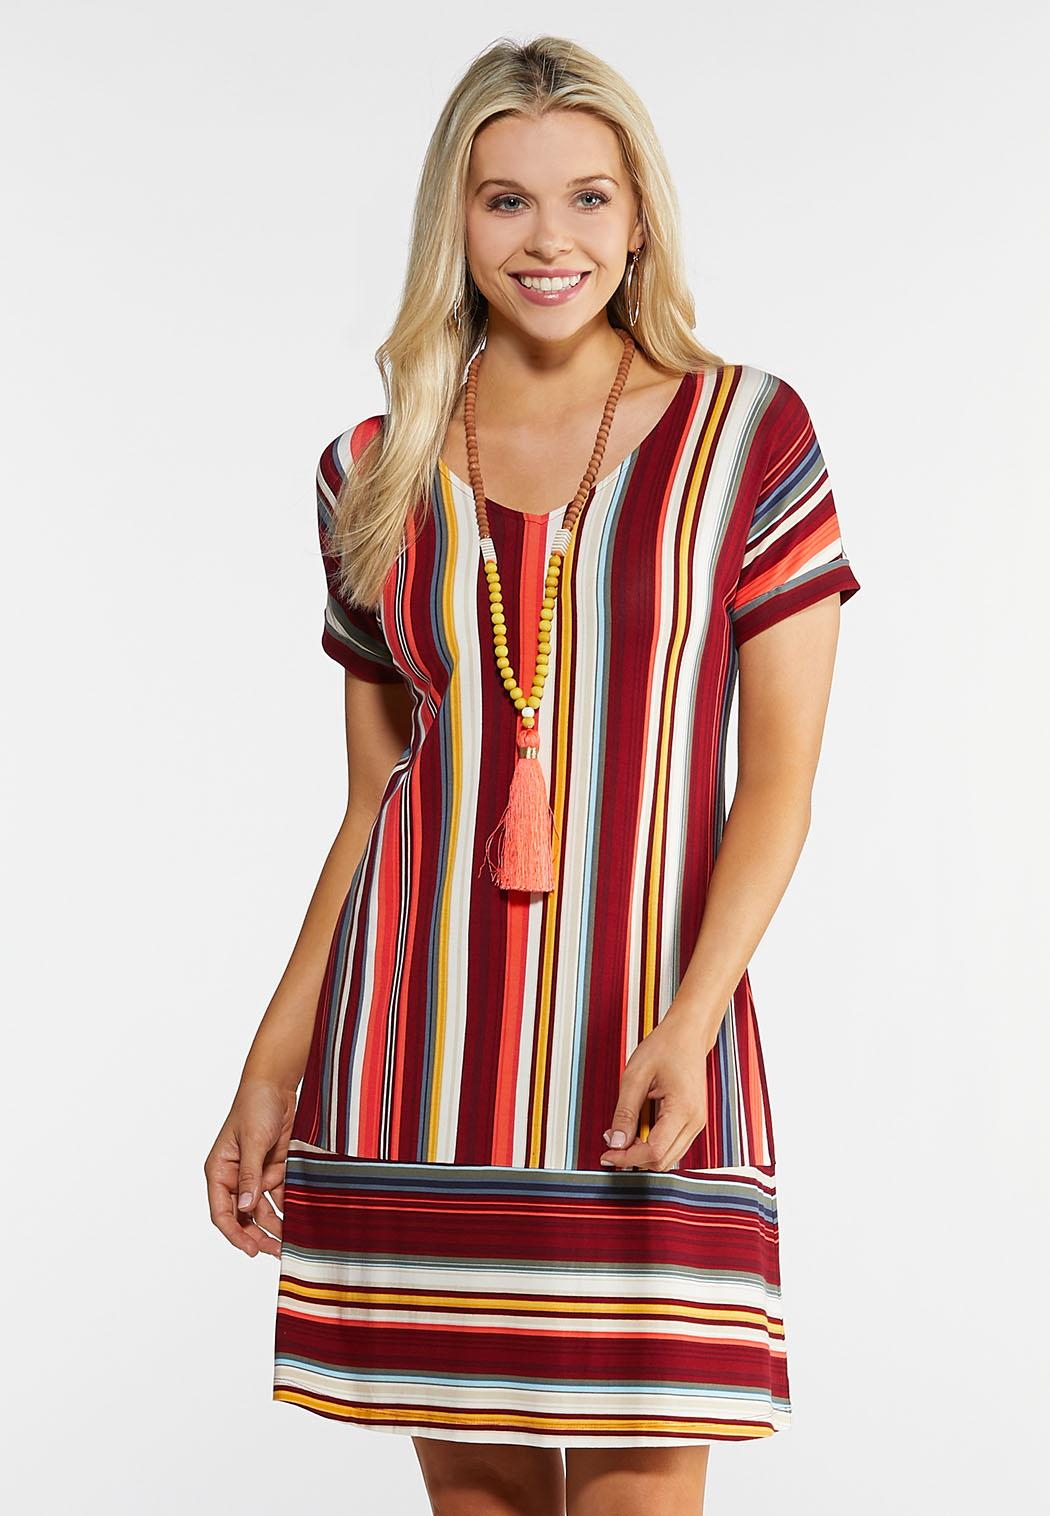 52b9df374dea Women's Dresses sizes 2-28 - Spring Dresses, Bell Sleeve Dresses, Long Sleeve  Swing Dresses & More